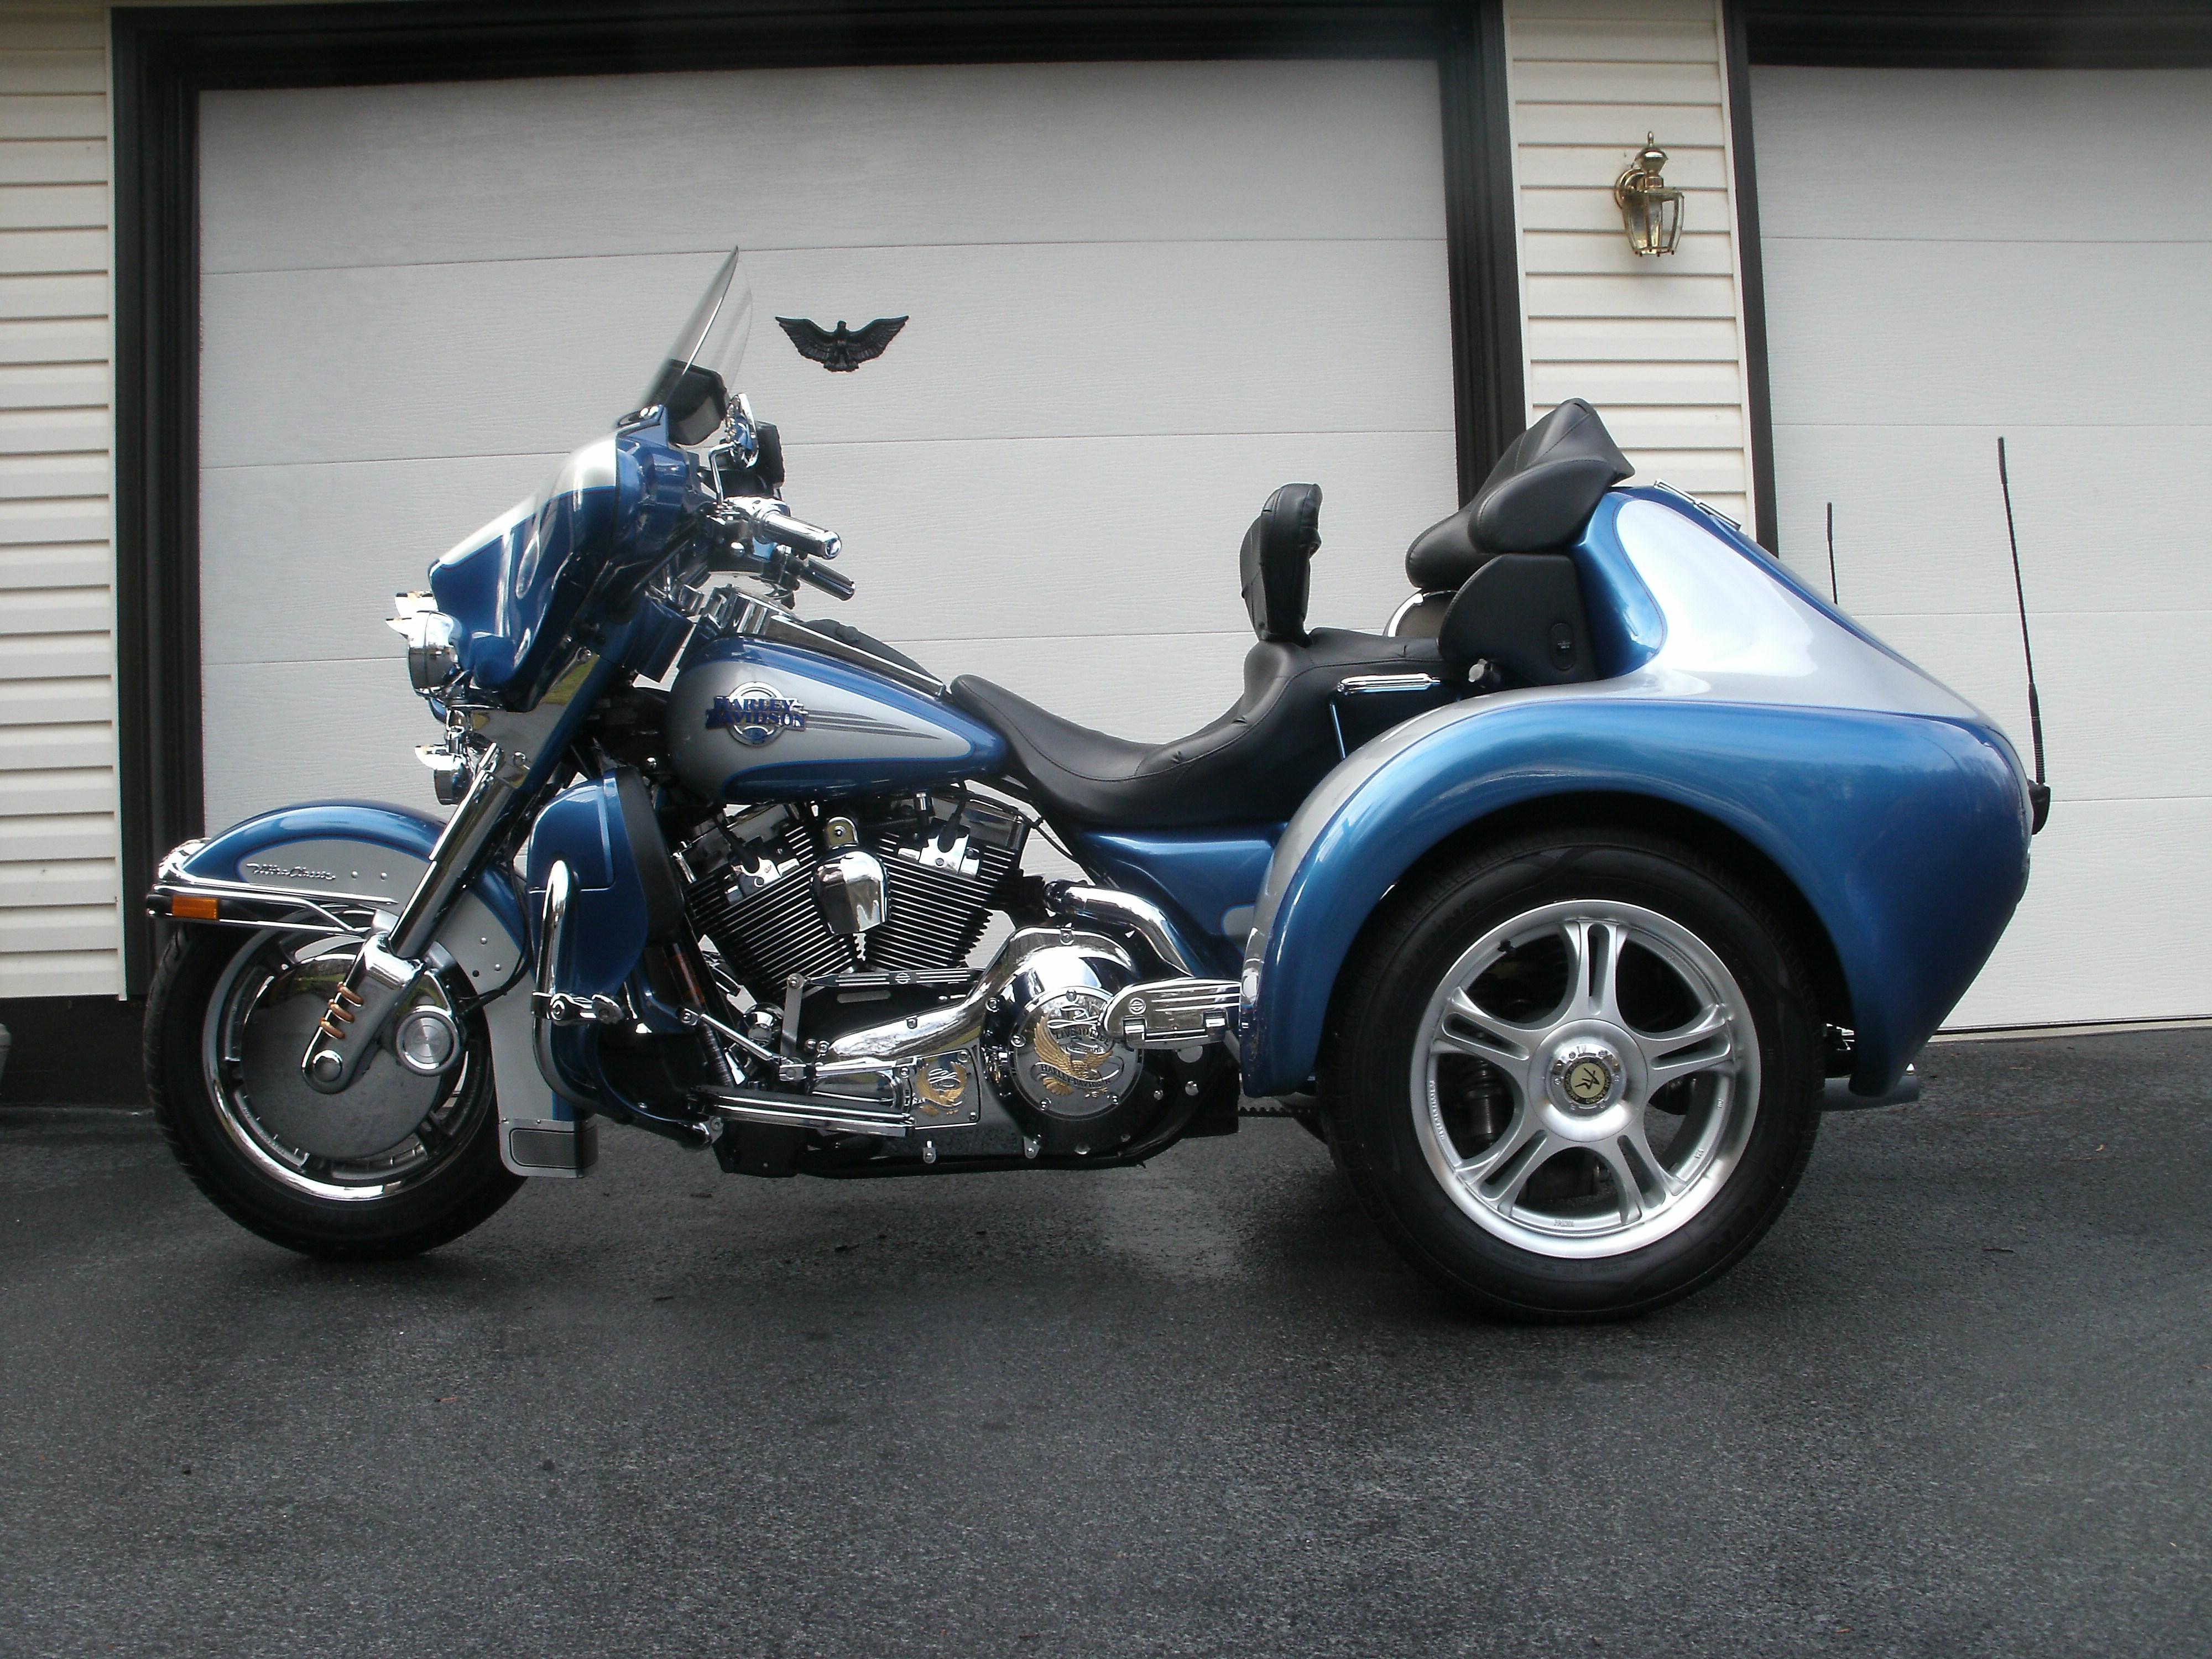 2006 harley davidson custom trike blue silver lancaster pennsylvania 695234 chopperexchange. Black Bedroom Furniture Sets. Home Design Ideas